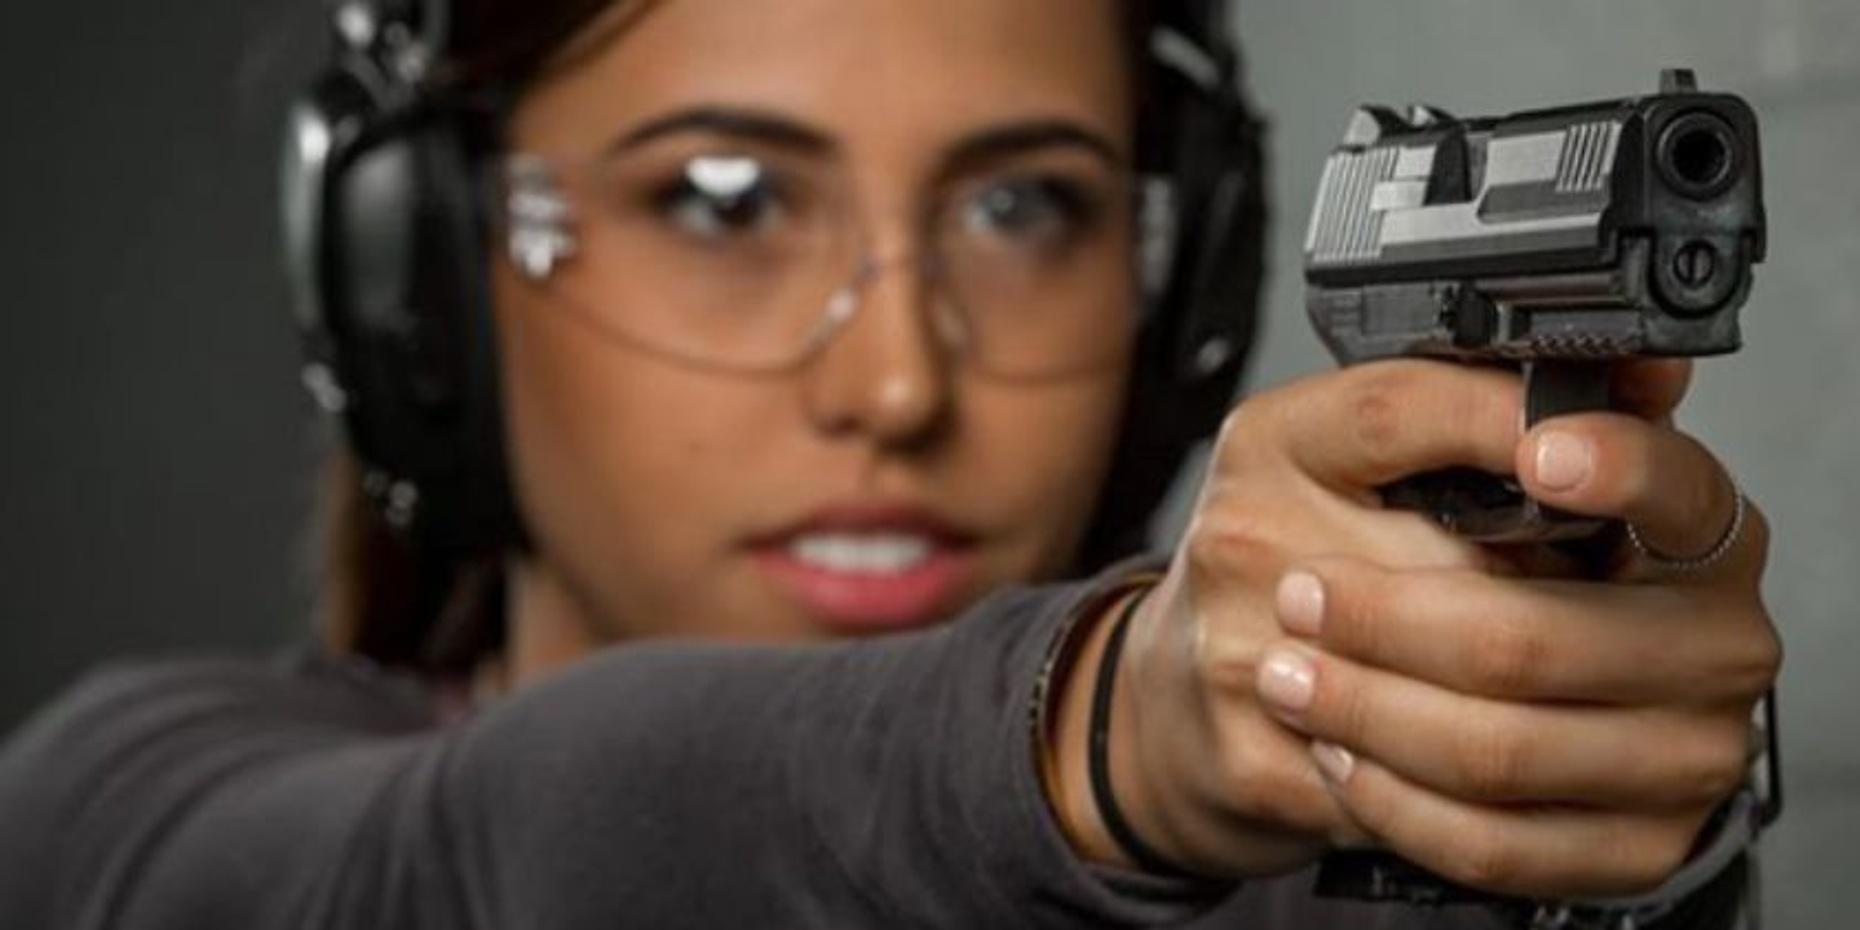 Shooting Practice with Law Enforcement Firearms in Las Vegas